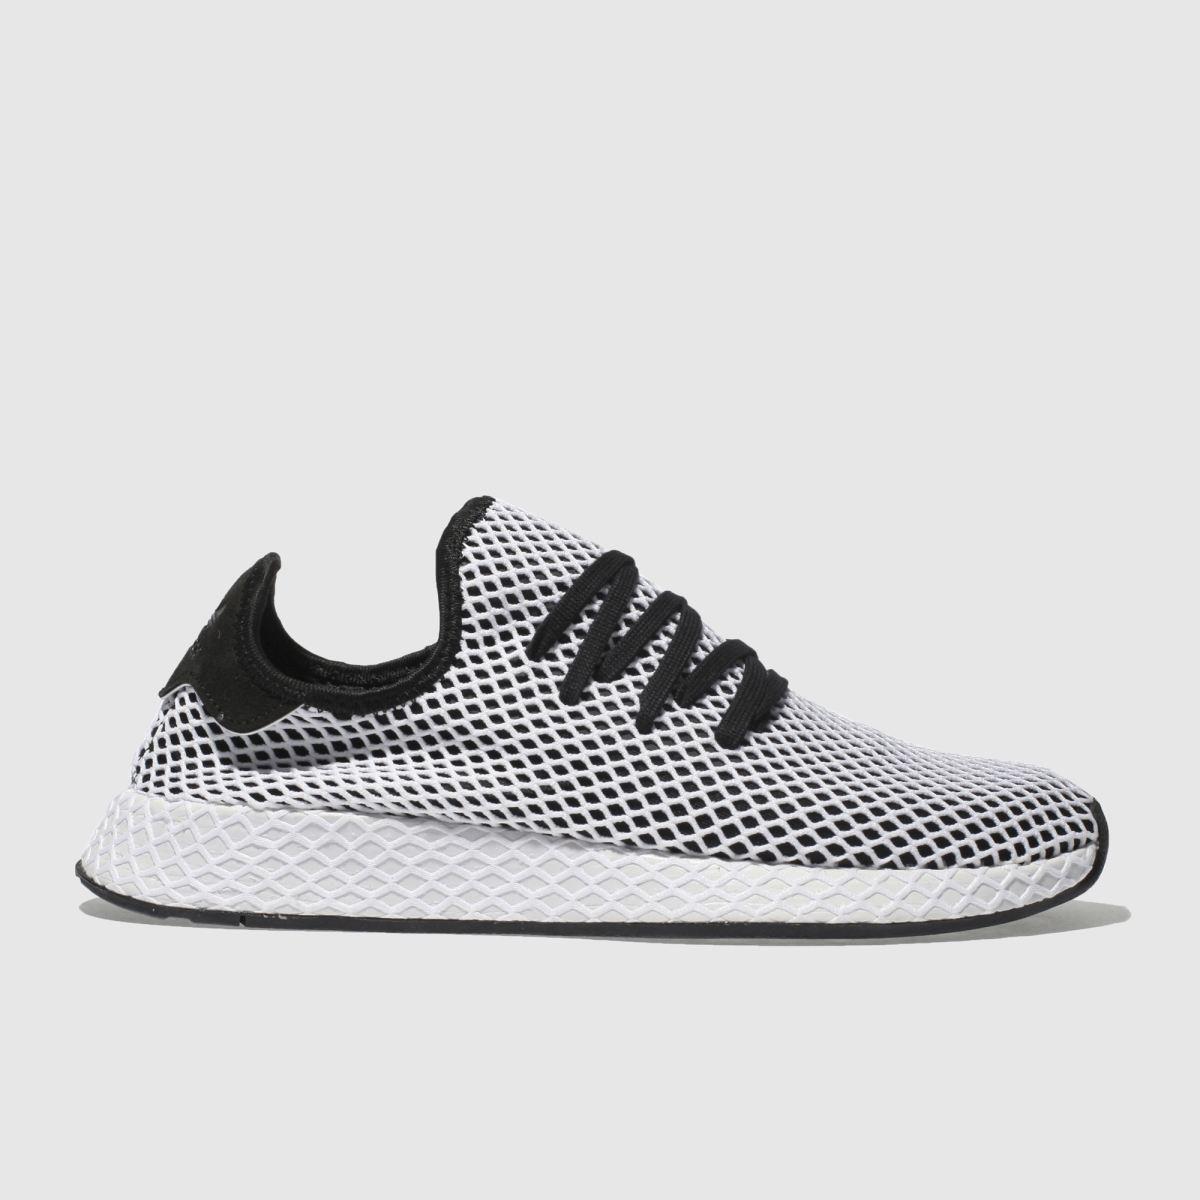 Adidas Black & White Deerupt Runner Trainers